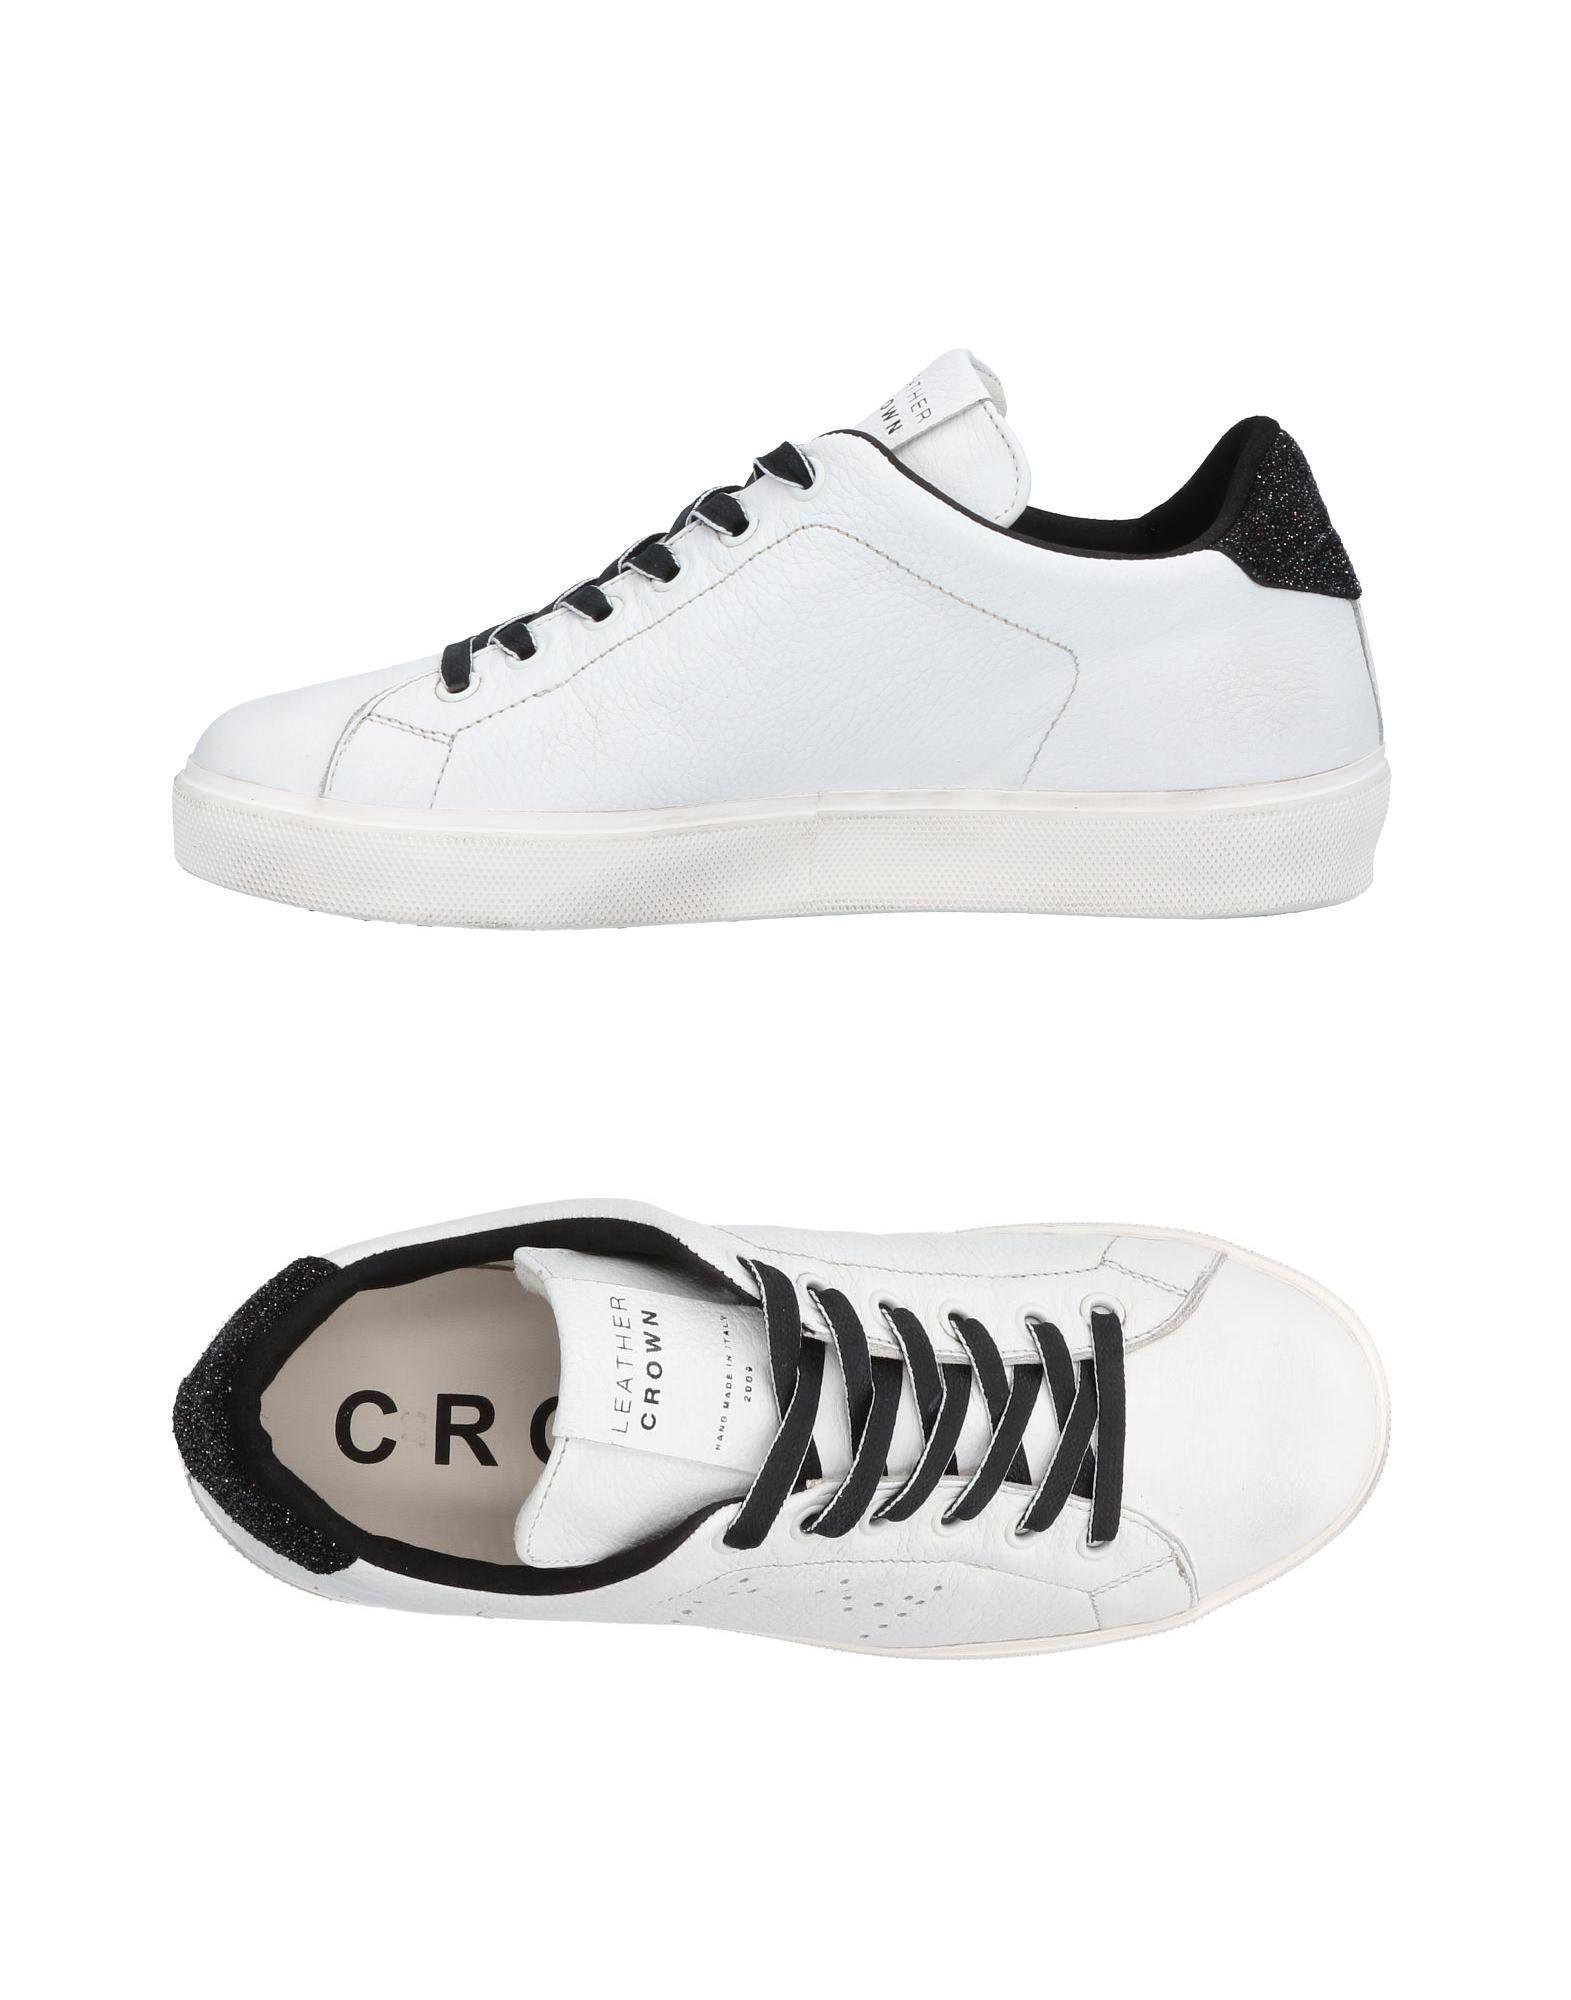 Leather Crown Sneakers Damen  11453498UJGut aussehende strapazierfähige Schuhe